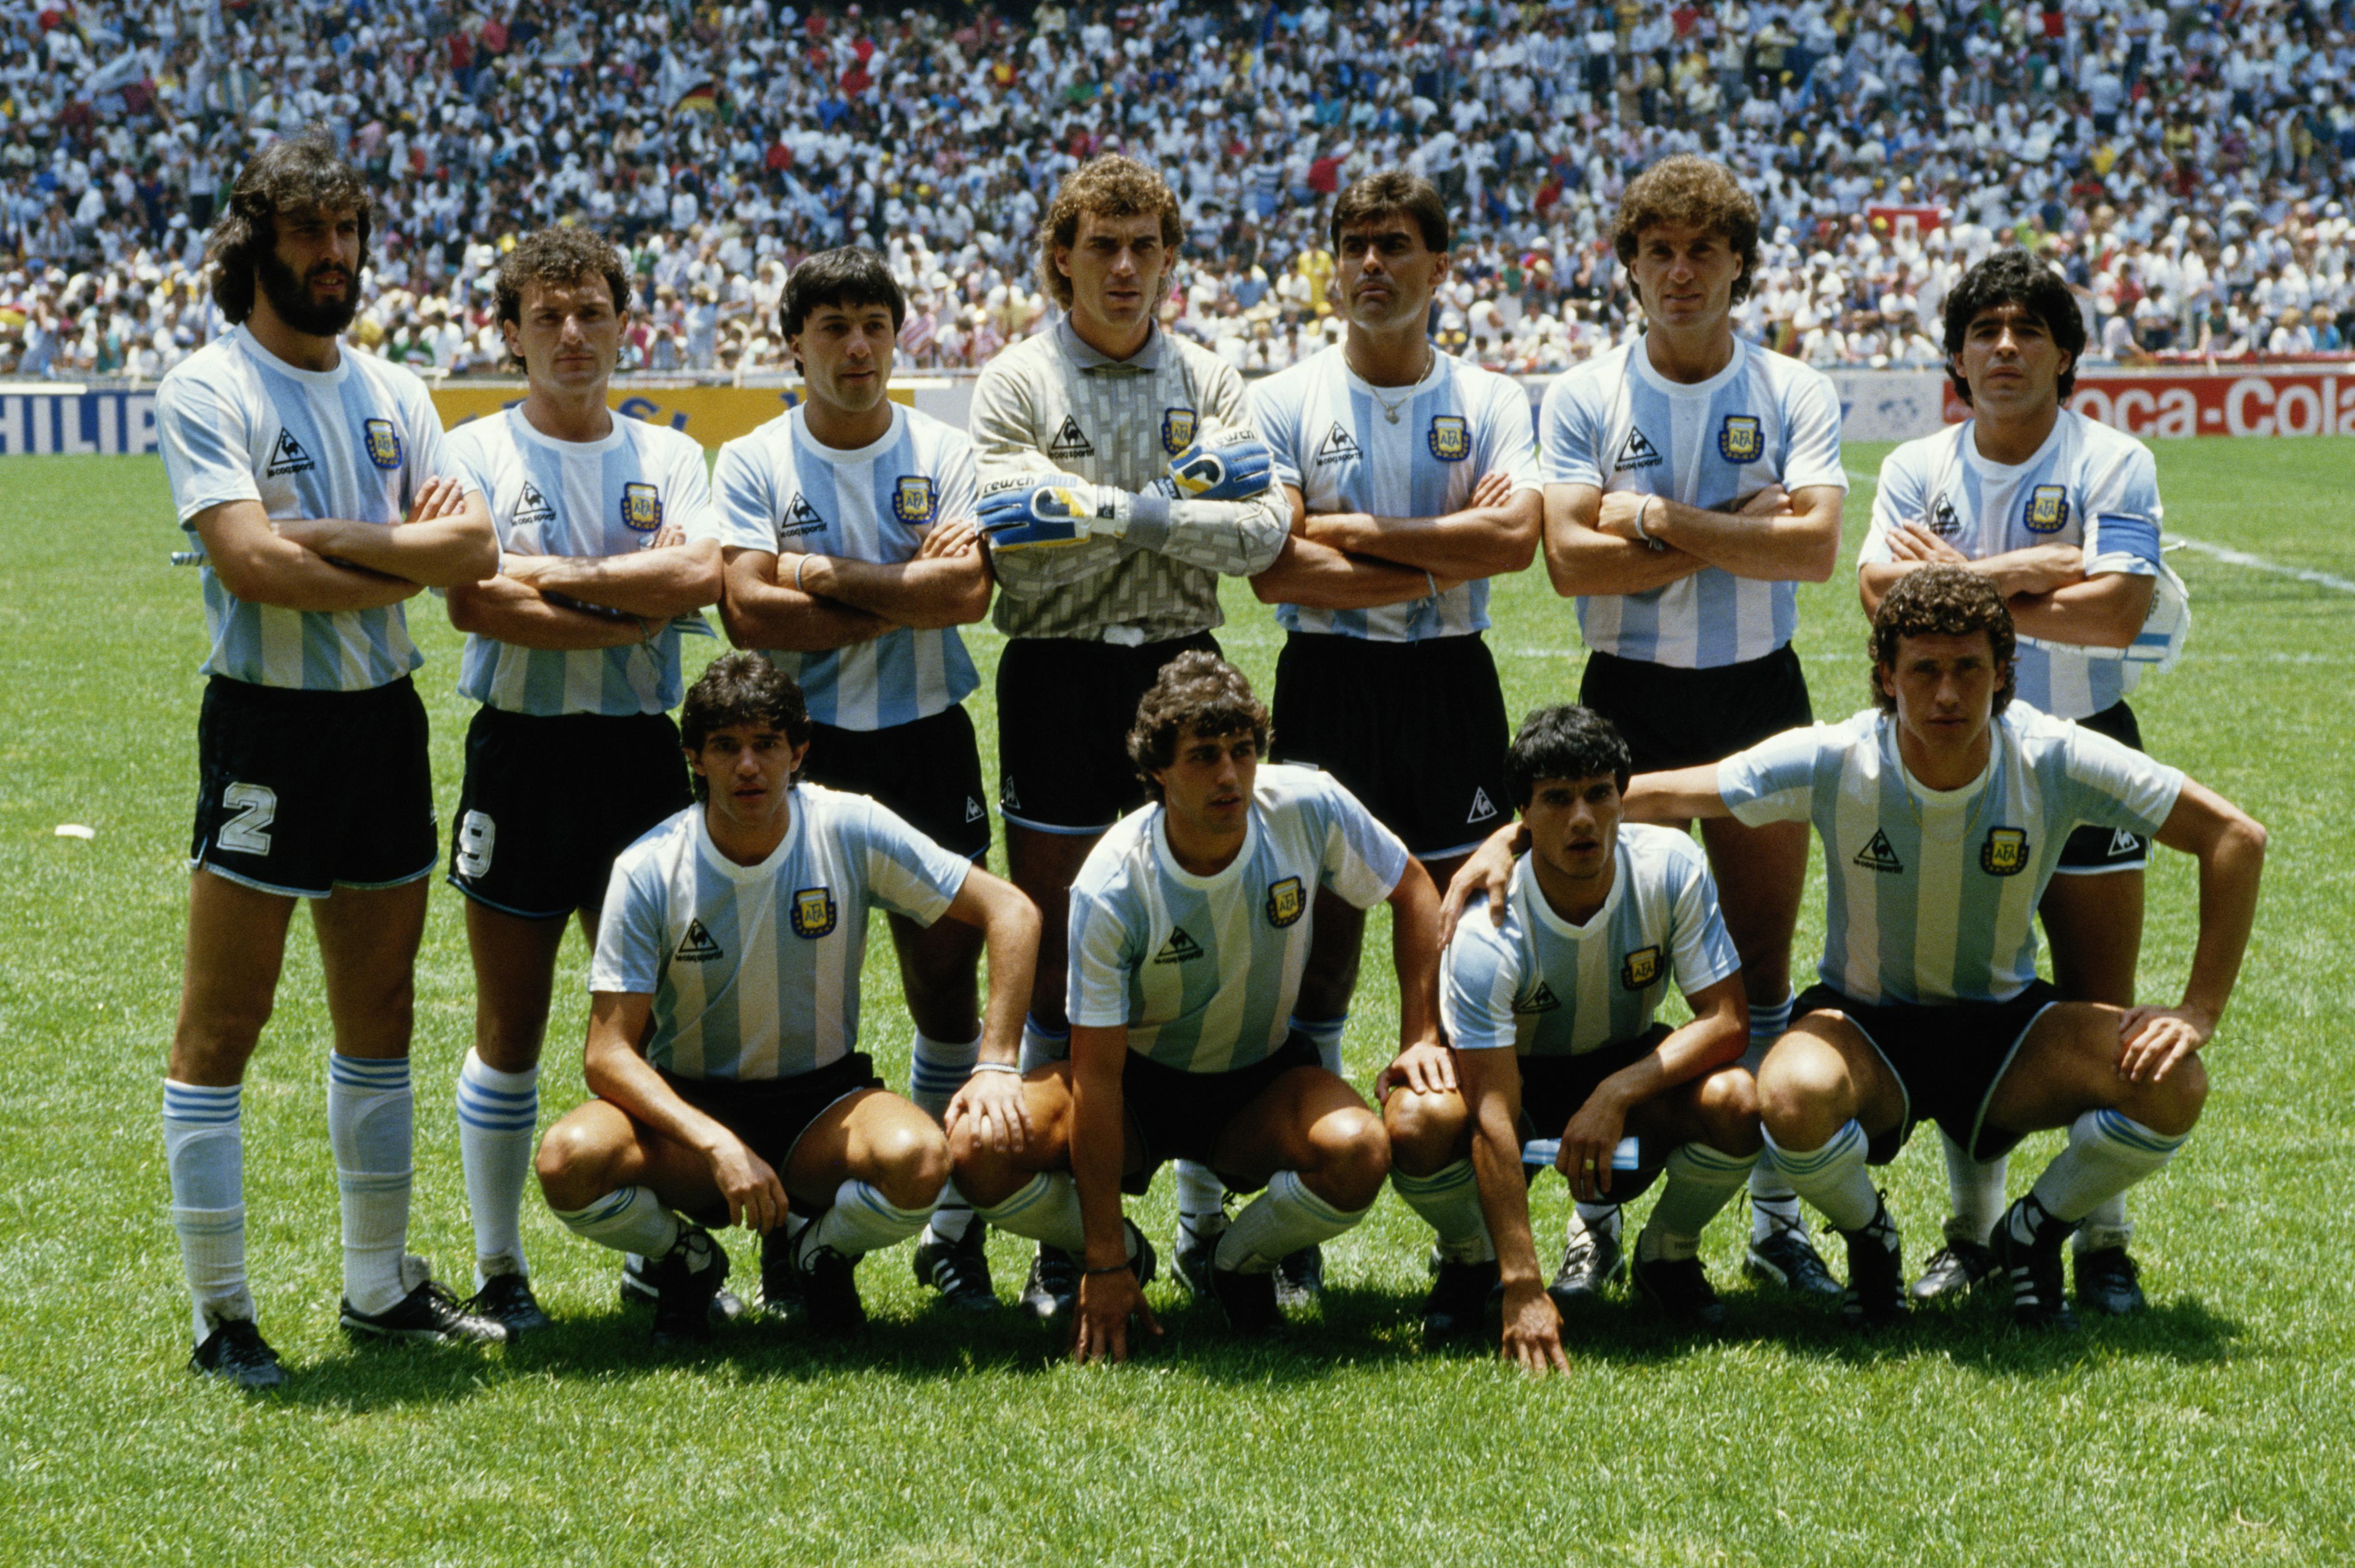 Nery PUMPIDO (GK), Sergio BATISTA, Jose BROWN, Jorge BURRUCHAGA, Jose CUCIUFFO, Diego MARADONA, Jorge VALDANO, Hector ENRIQUE, Ricardo GIUSTI, Julio OLARTICOECHEA, Oscar RUGGERI  of Argentina line up before the FIFA World Cup final on 29 June 1986 at the